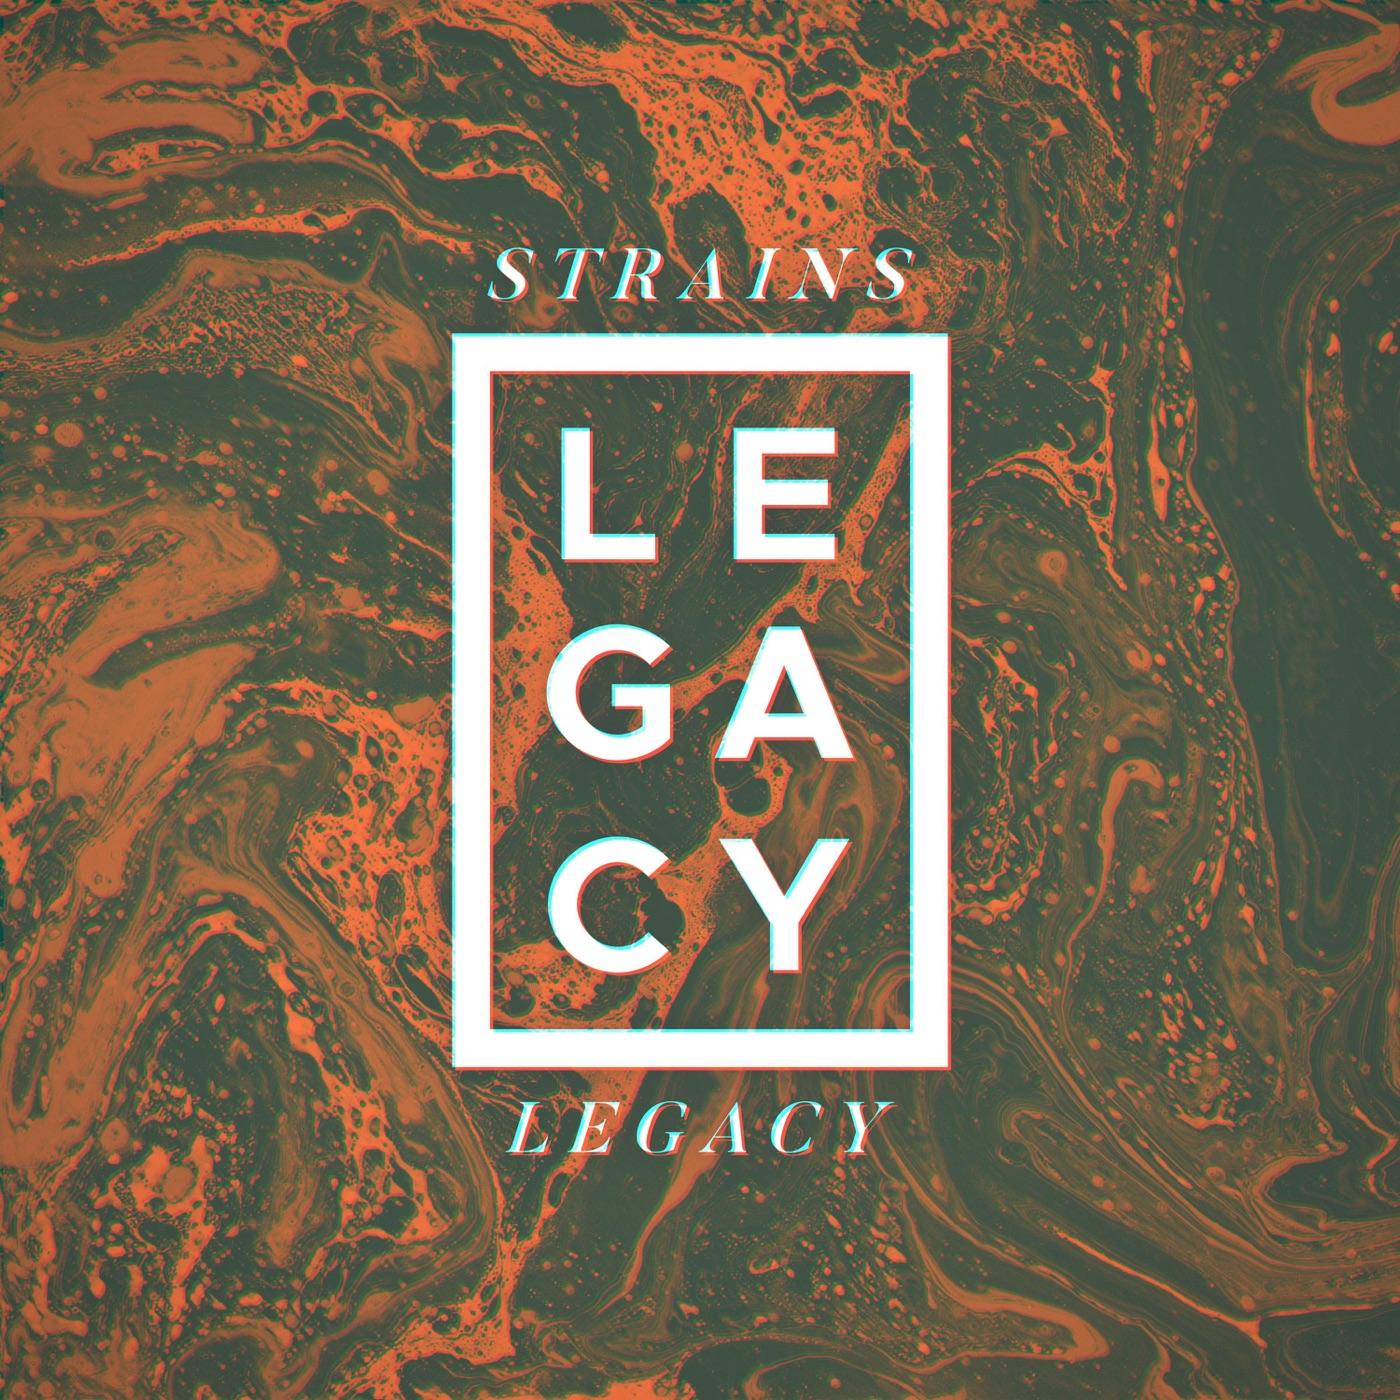 Strains - Legacy [single] (2018)